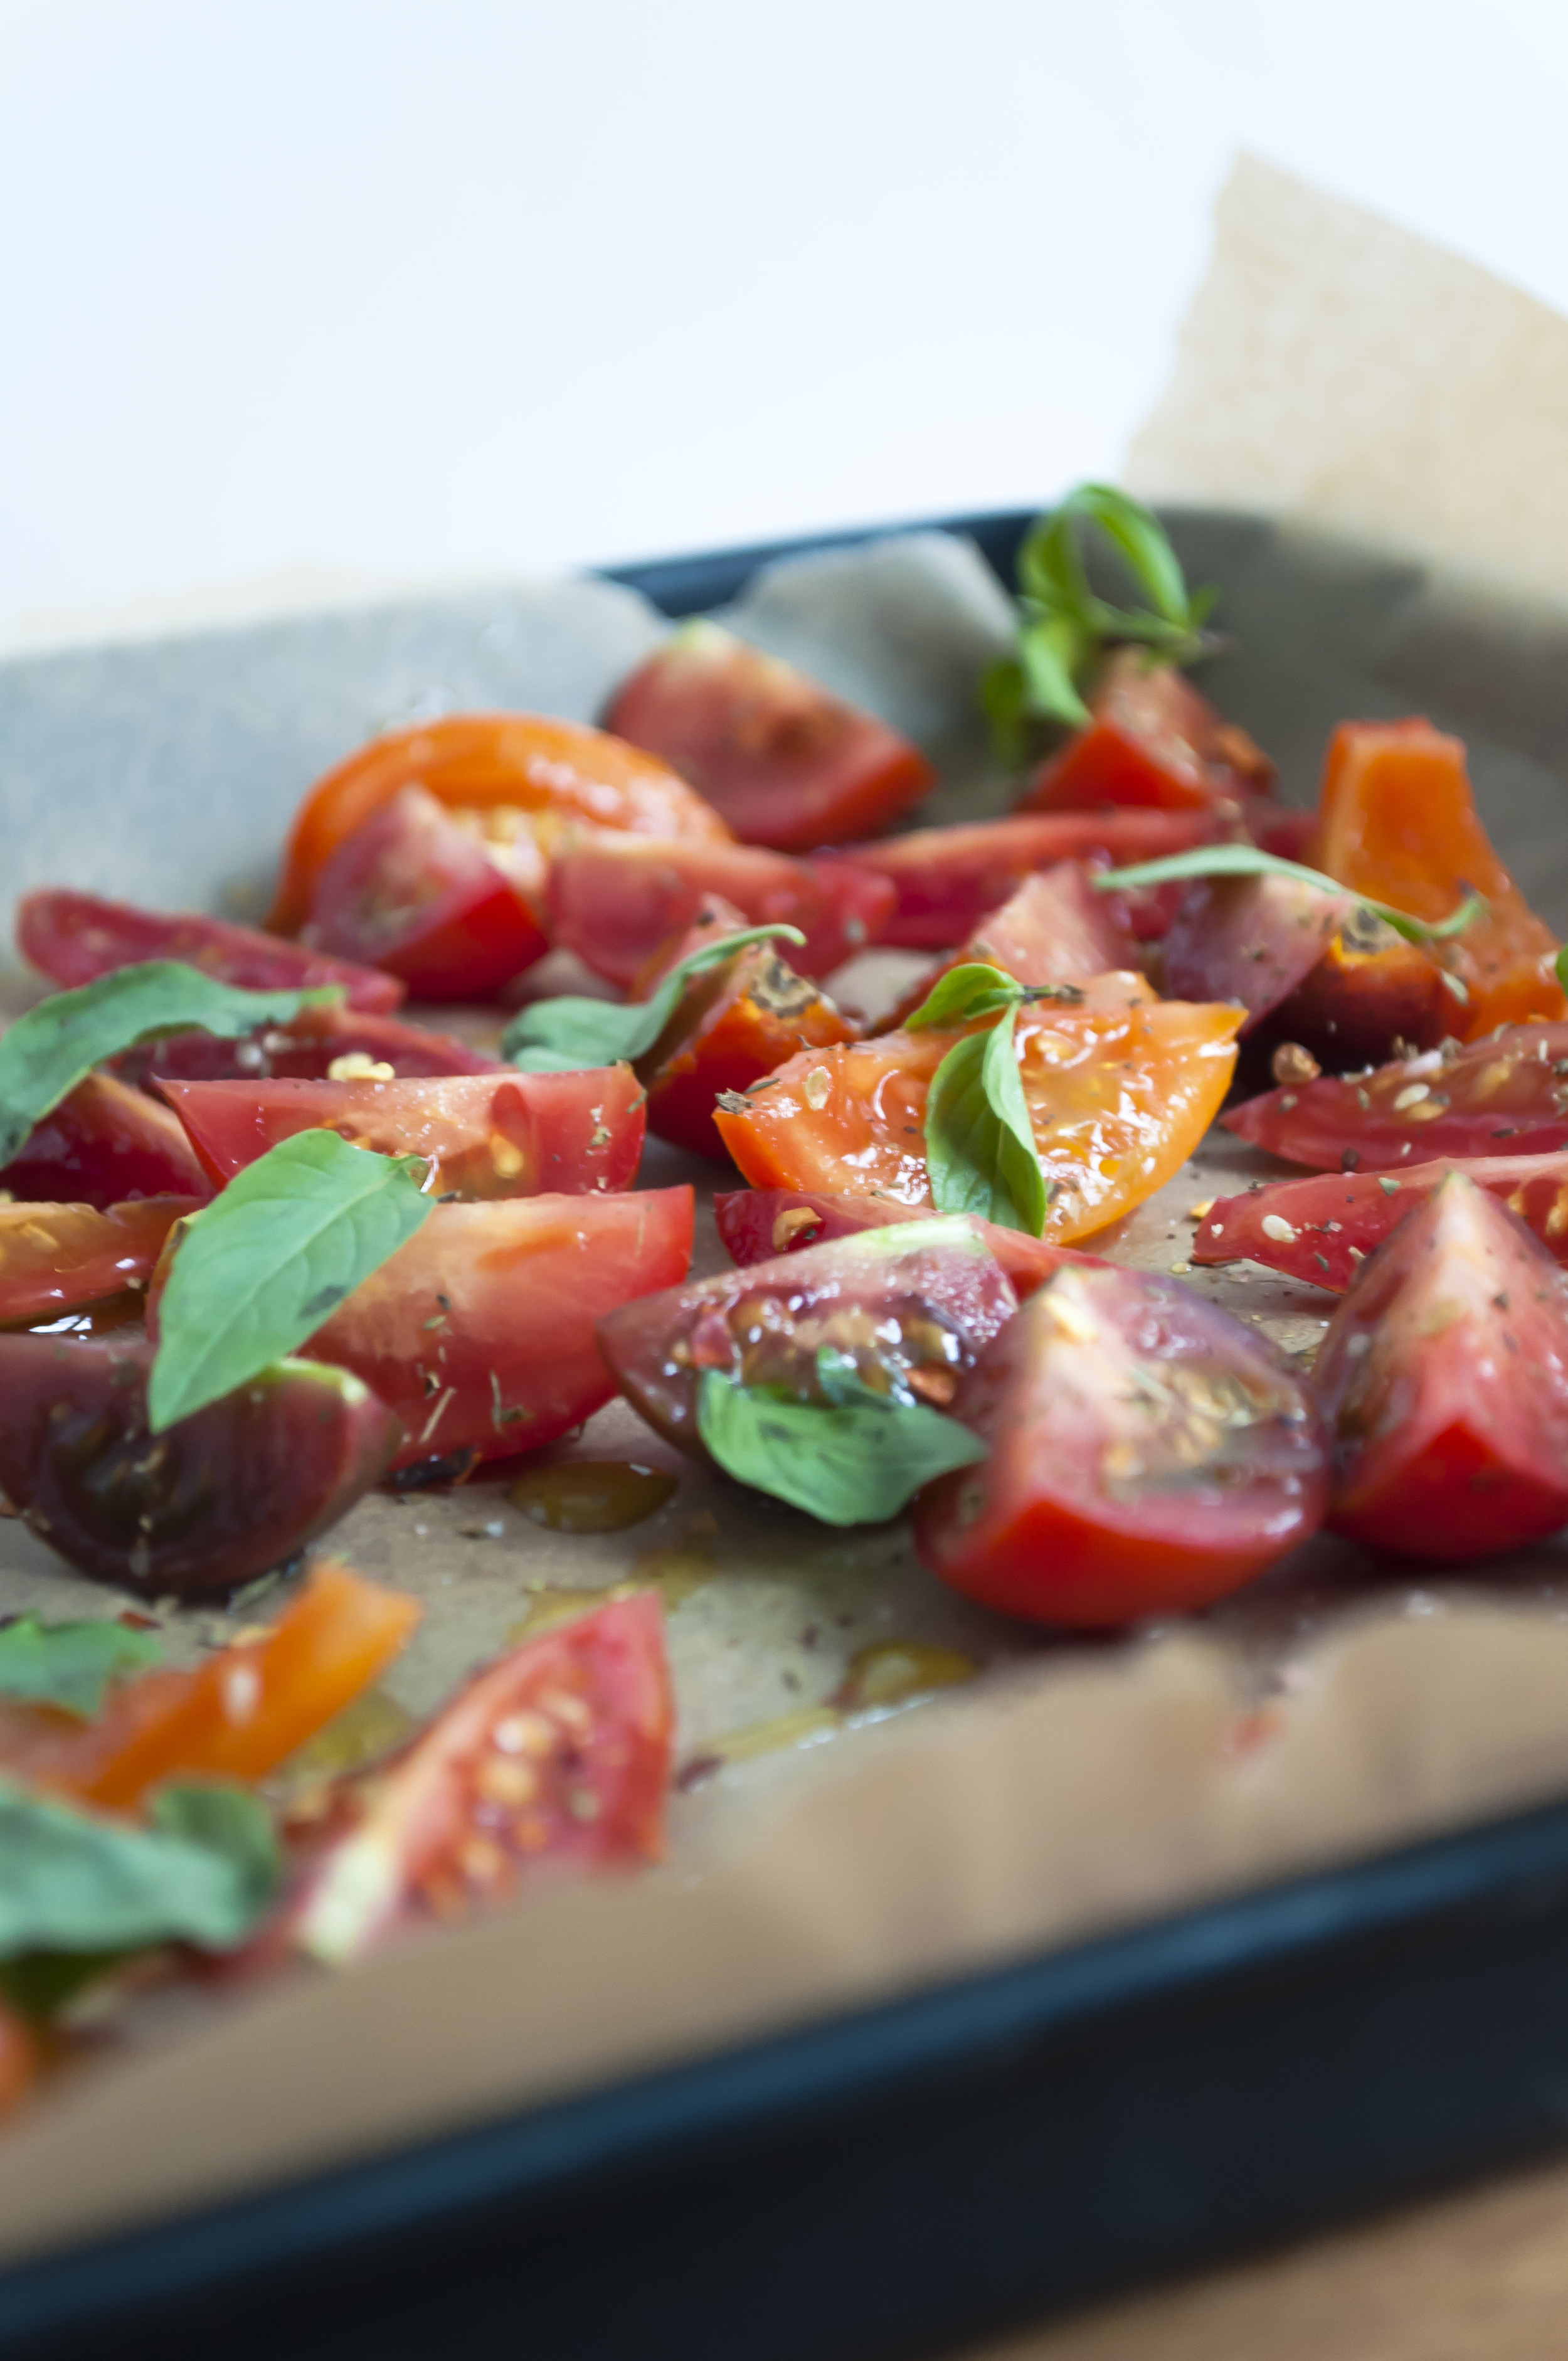 Slow Roasted Heirloom Cherry Tomatoes